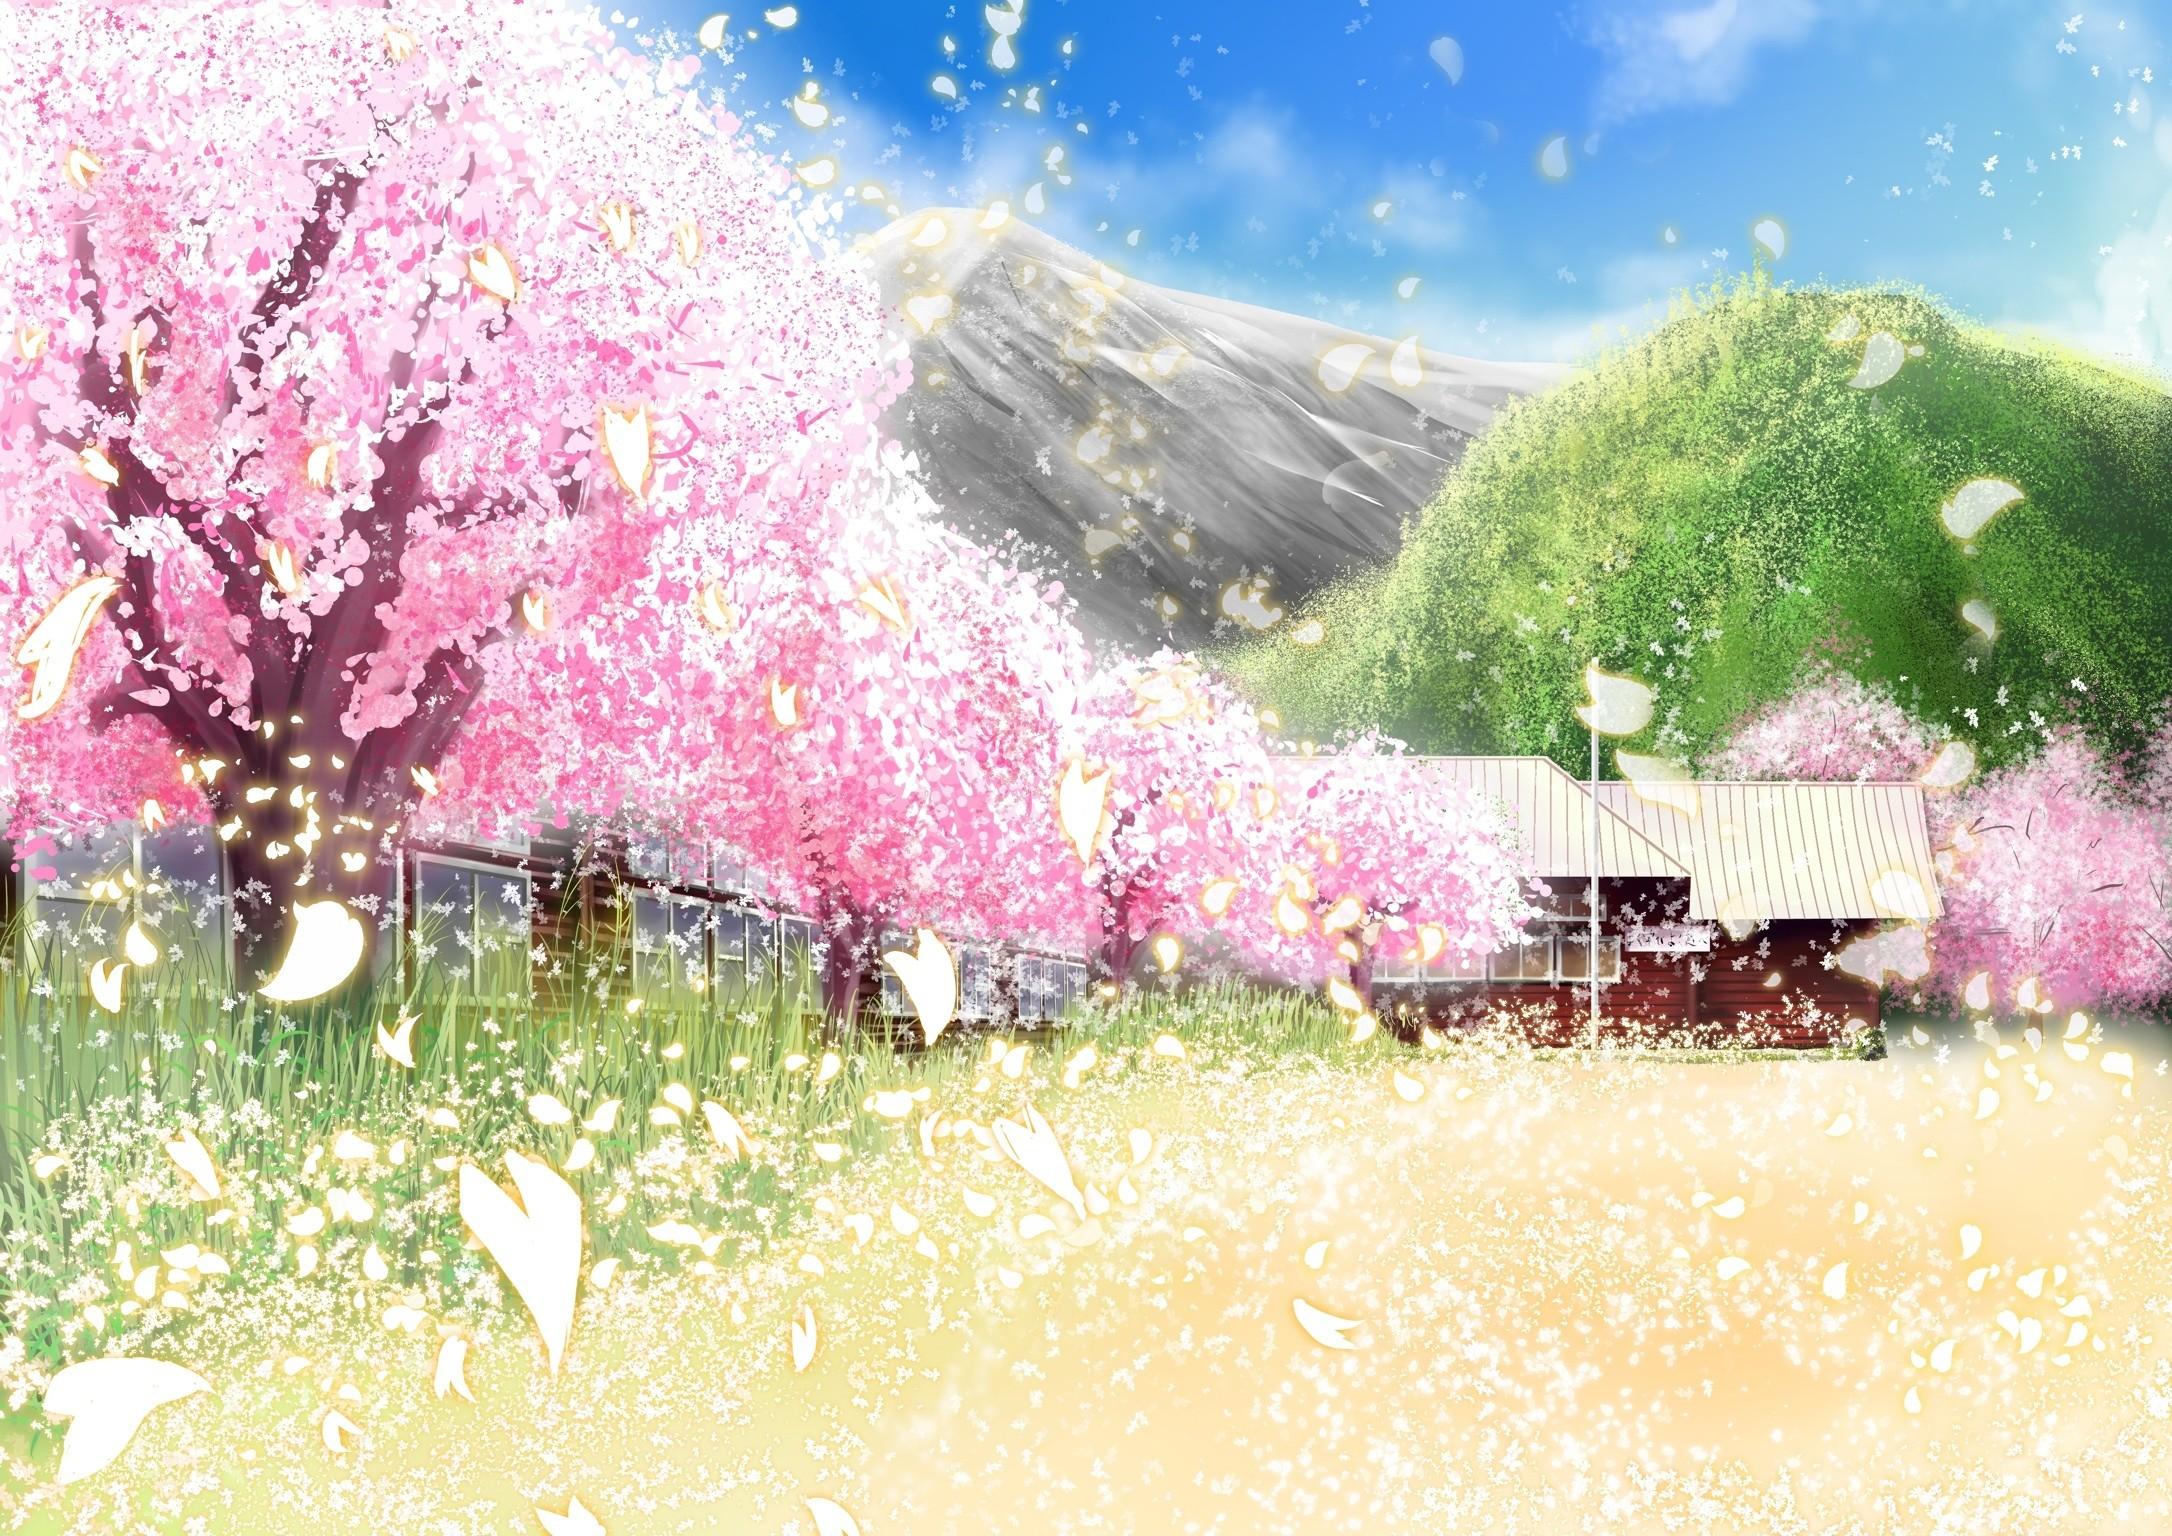 Original building cherry blossoms grass landscape original petals scenic  sylphidehachioji tree wallpaper | | 97737 | WallpaperUP